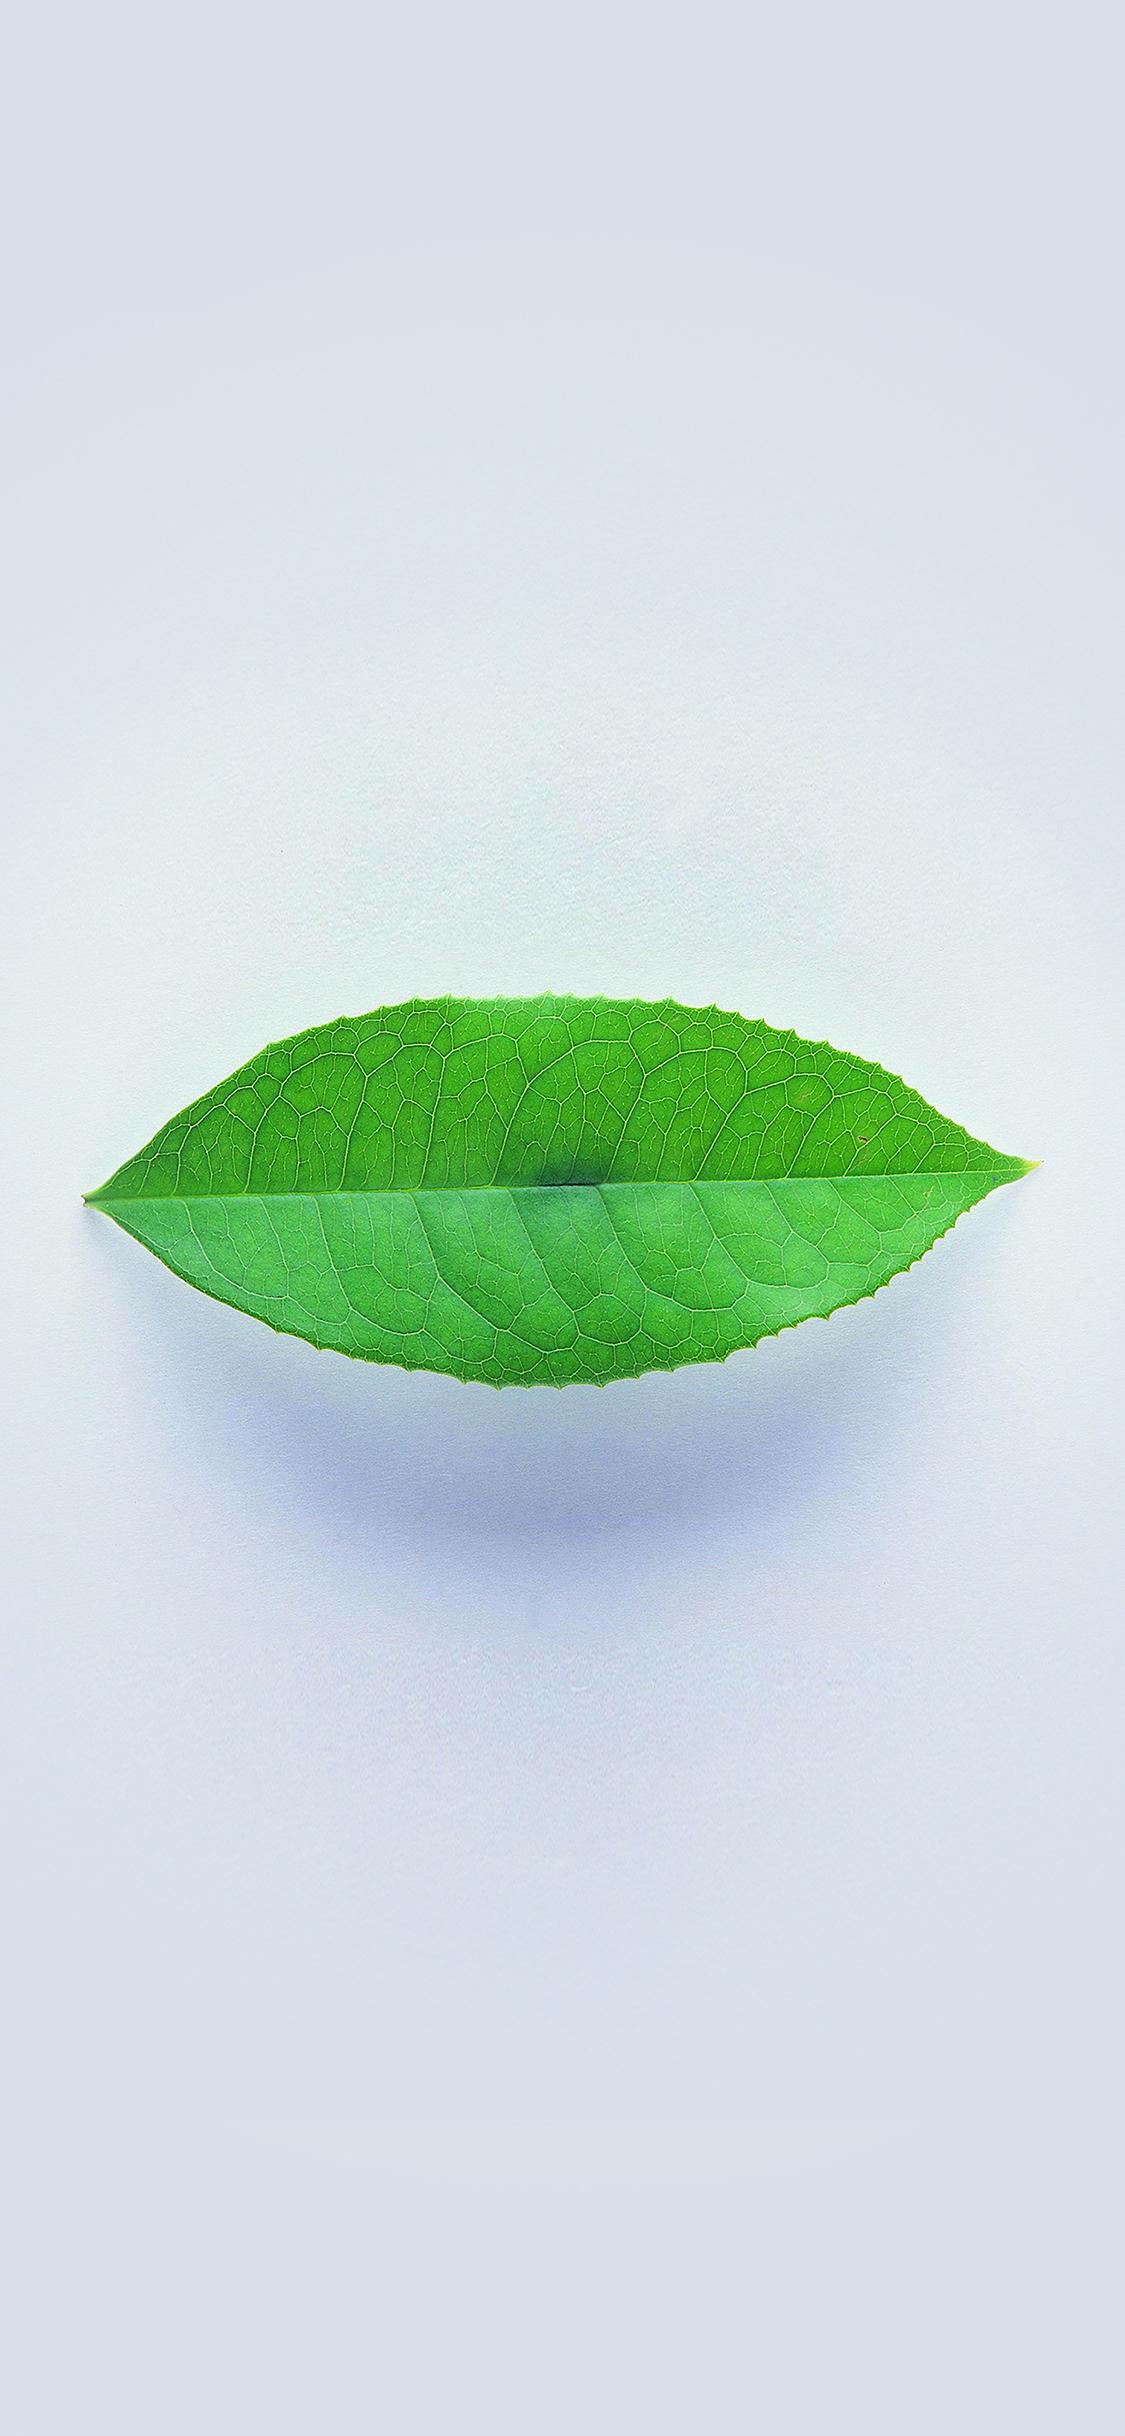 iPhoneXpapers.com-Apple-iPhone-wallpaper-ah89-green-leaf-minimal-nature-art